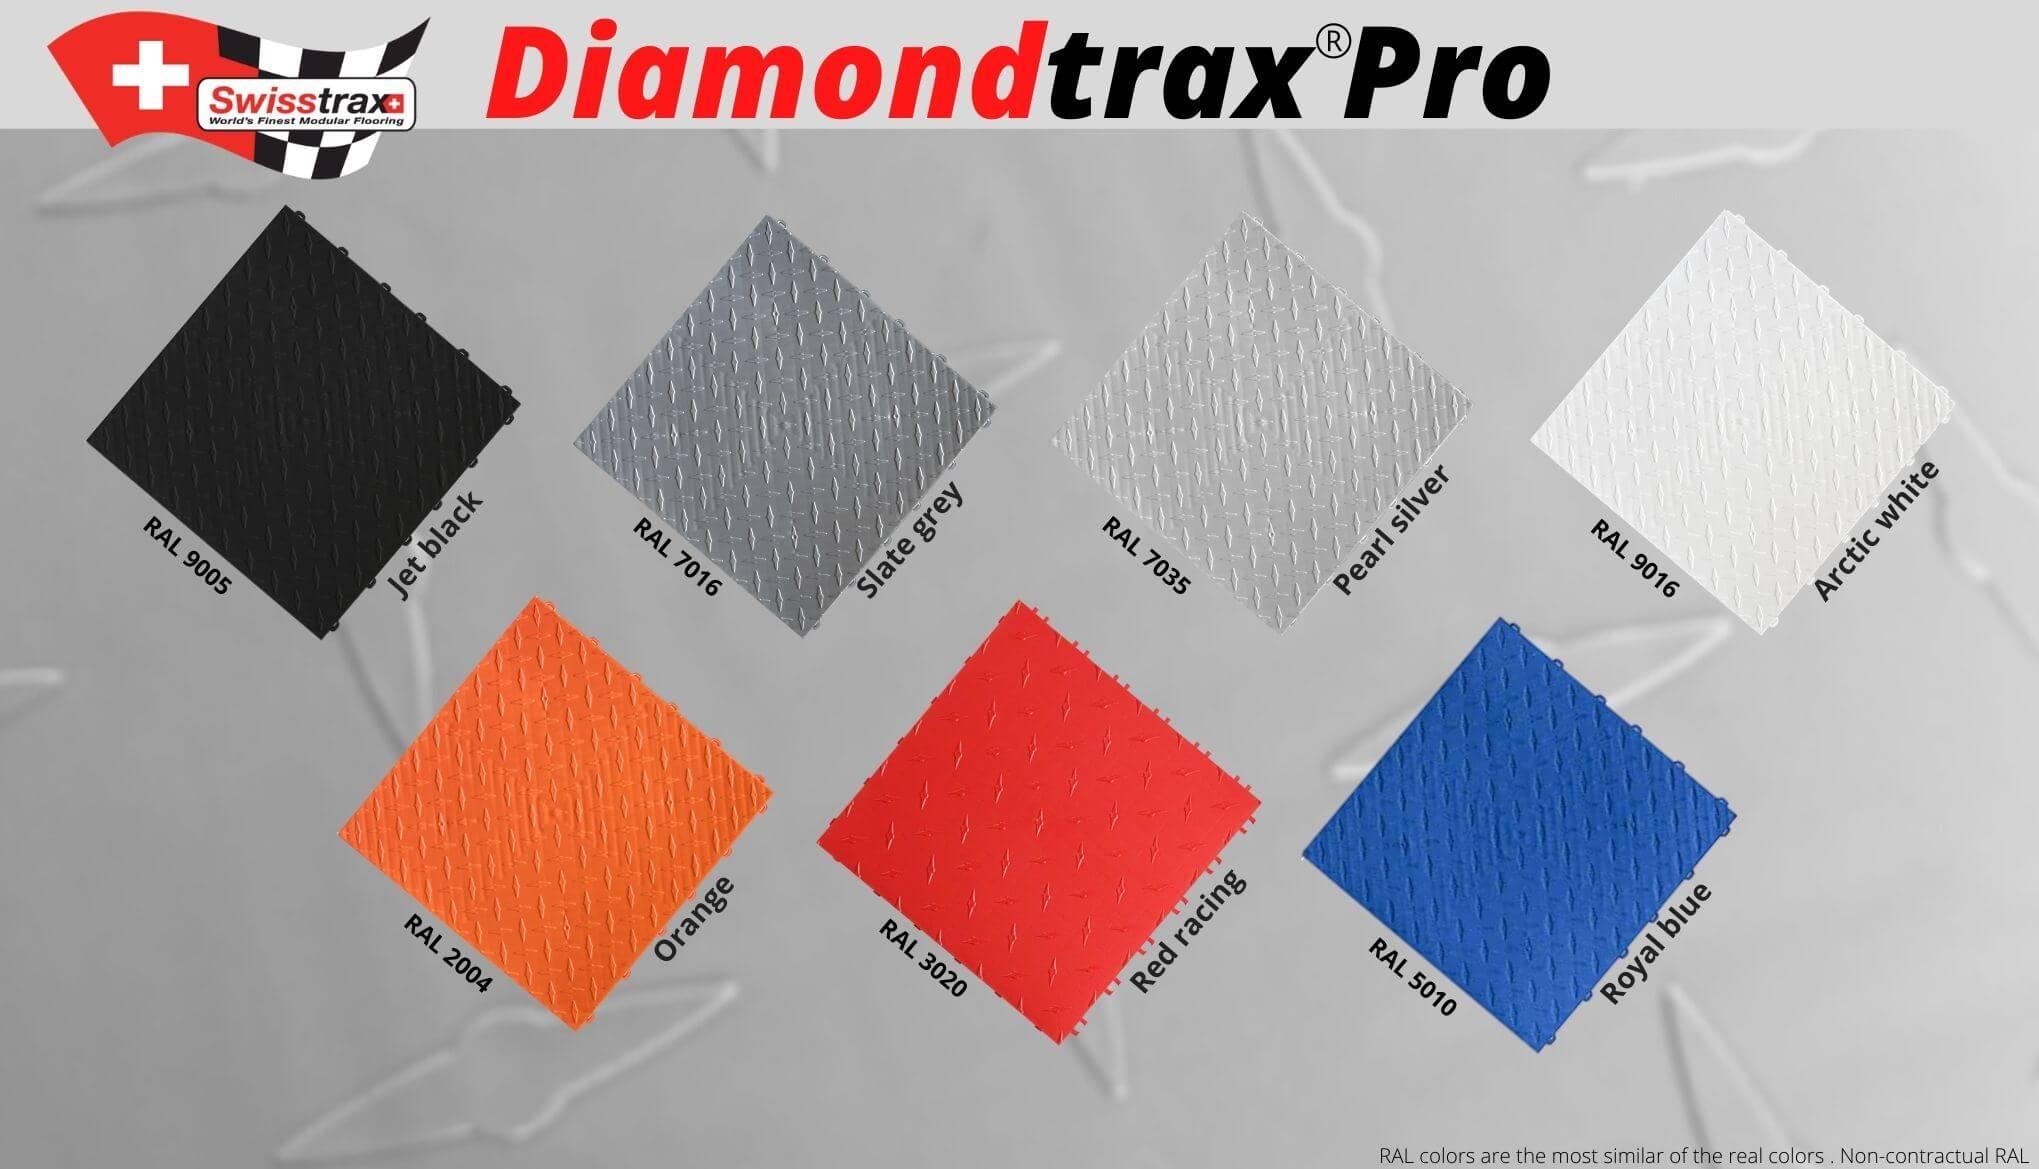 diamondtrax pro colors